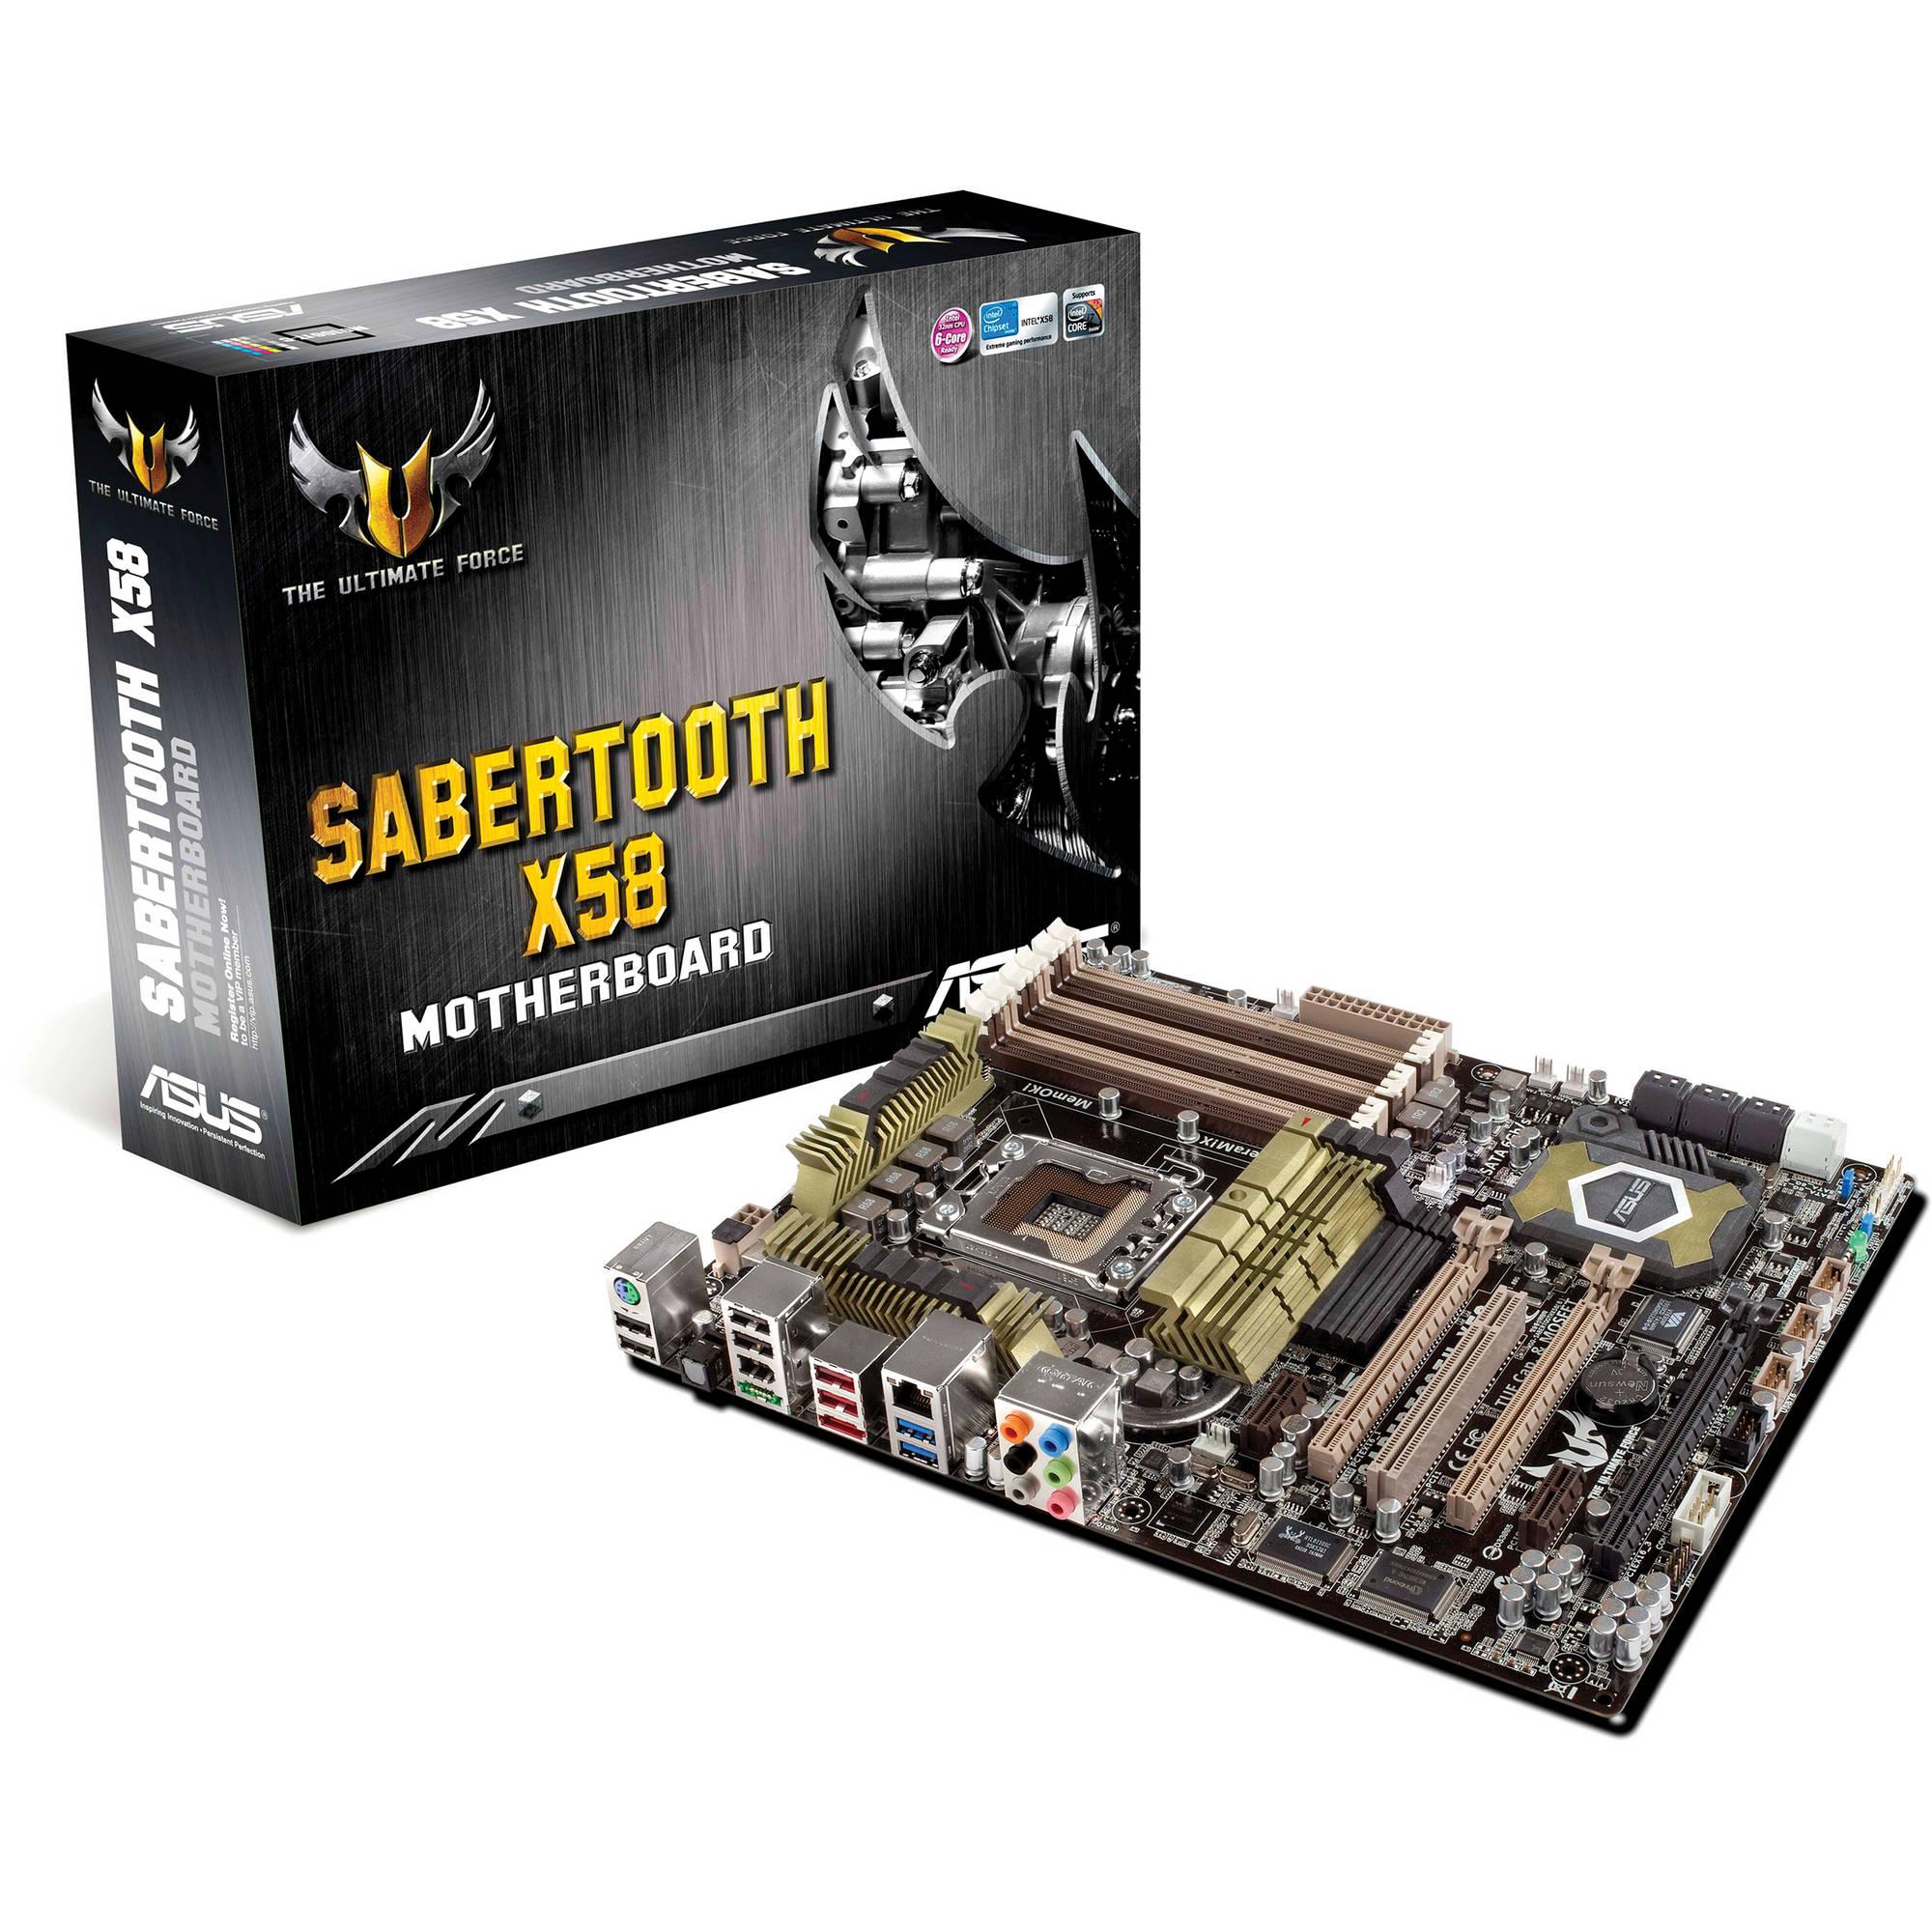 ASUS SABERTOOTH X58 Motherboard